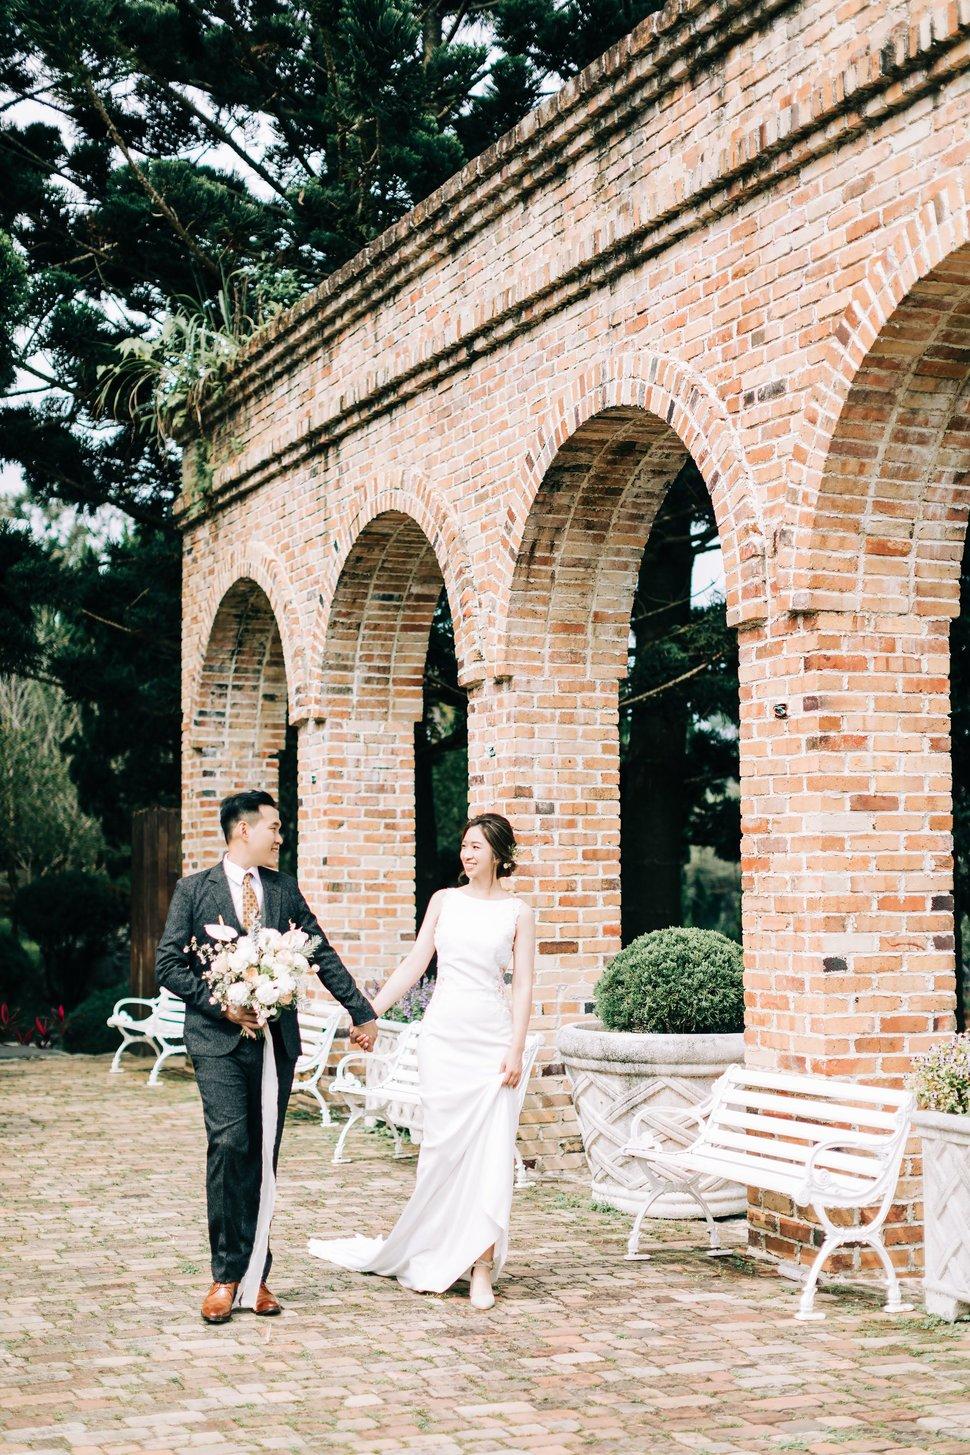 AG3_6497A - Cradle Wedding搖籃手工婚紗《結婚吧》